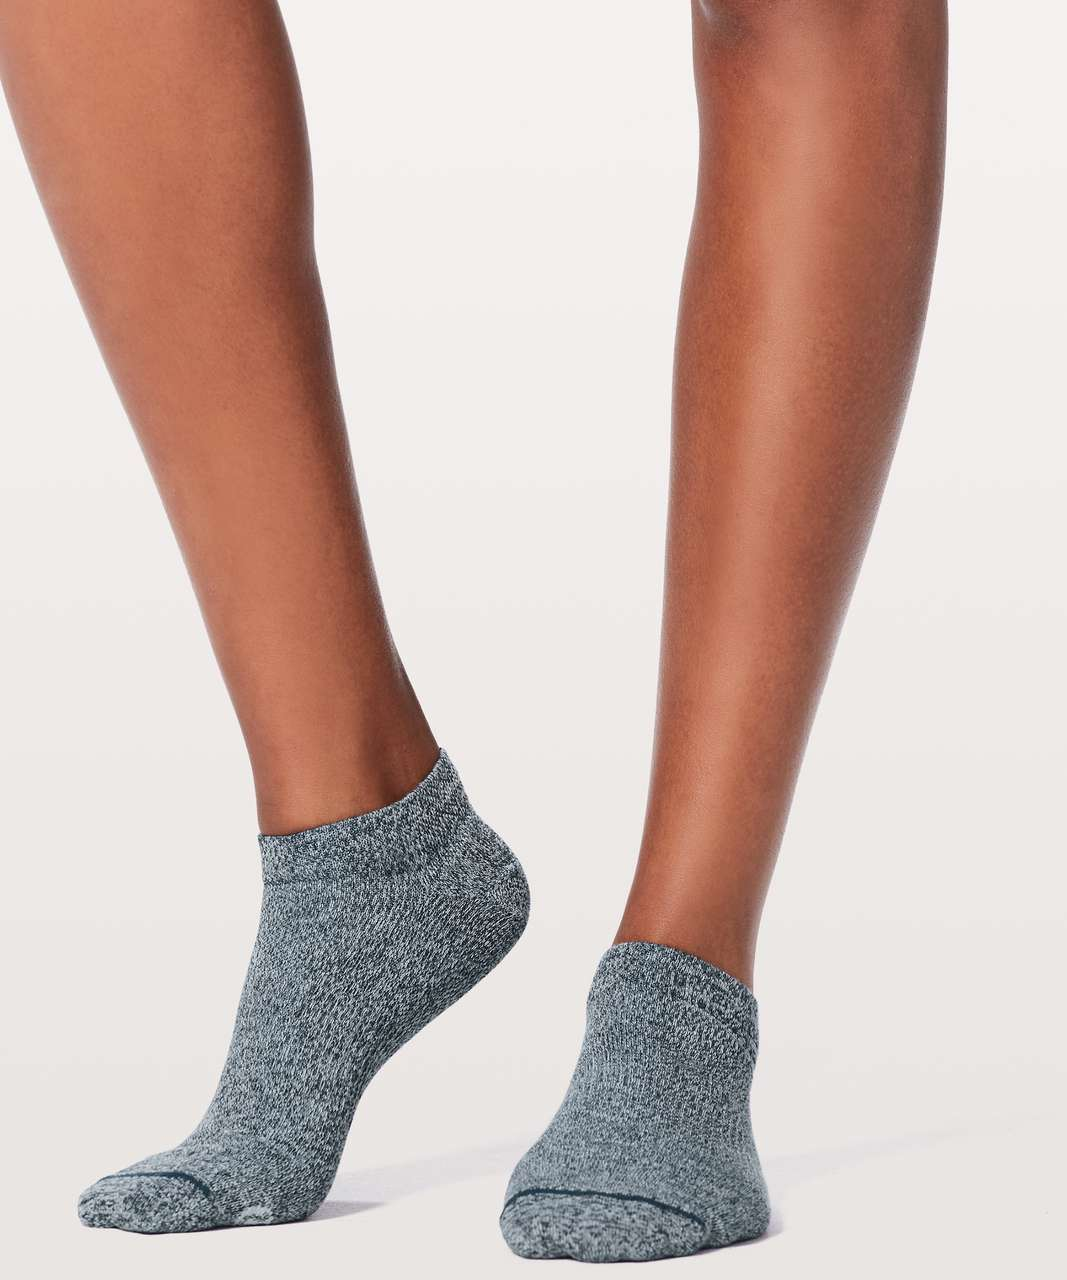 Lululemon All In A Day Sock - Magnetic Blue / Breezy / True Navy